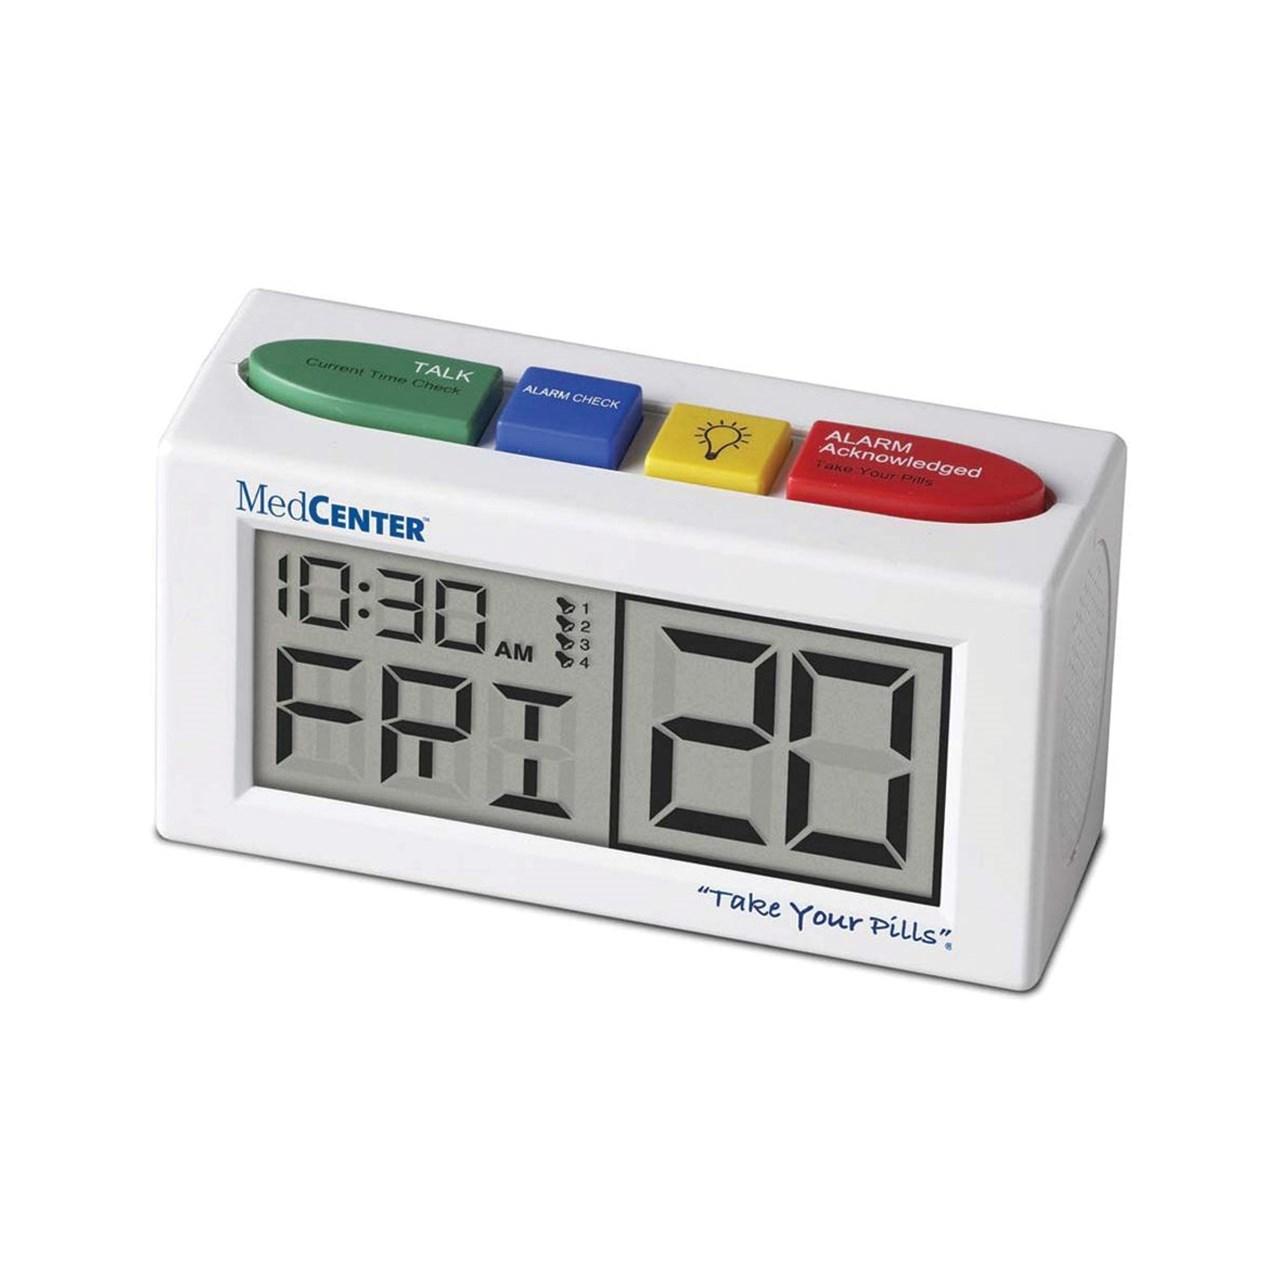 MaxiAids | Talking Alarm Clock Medication Reminder